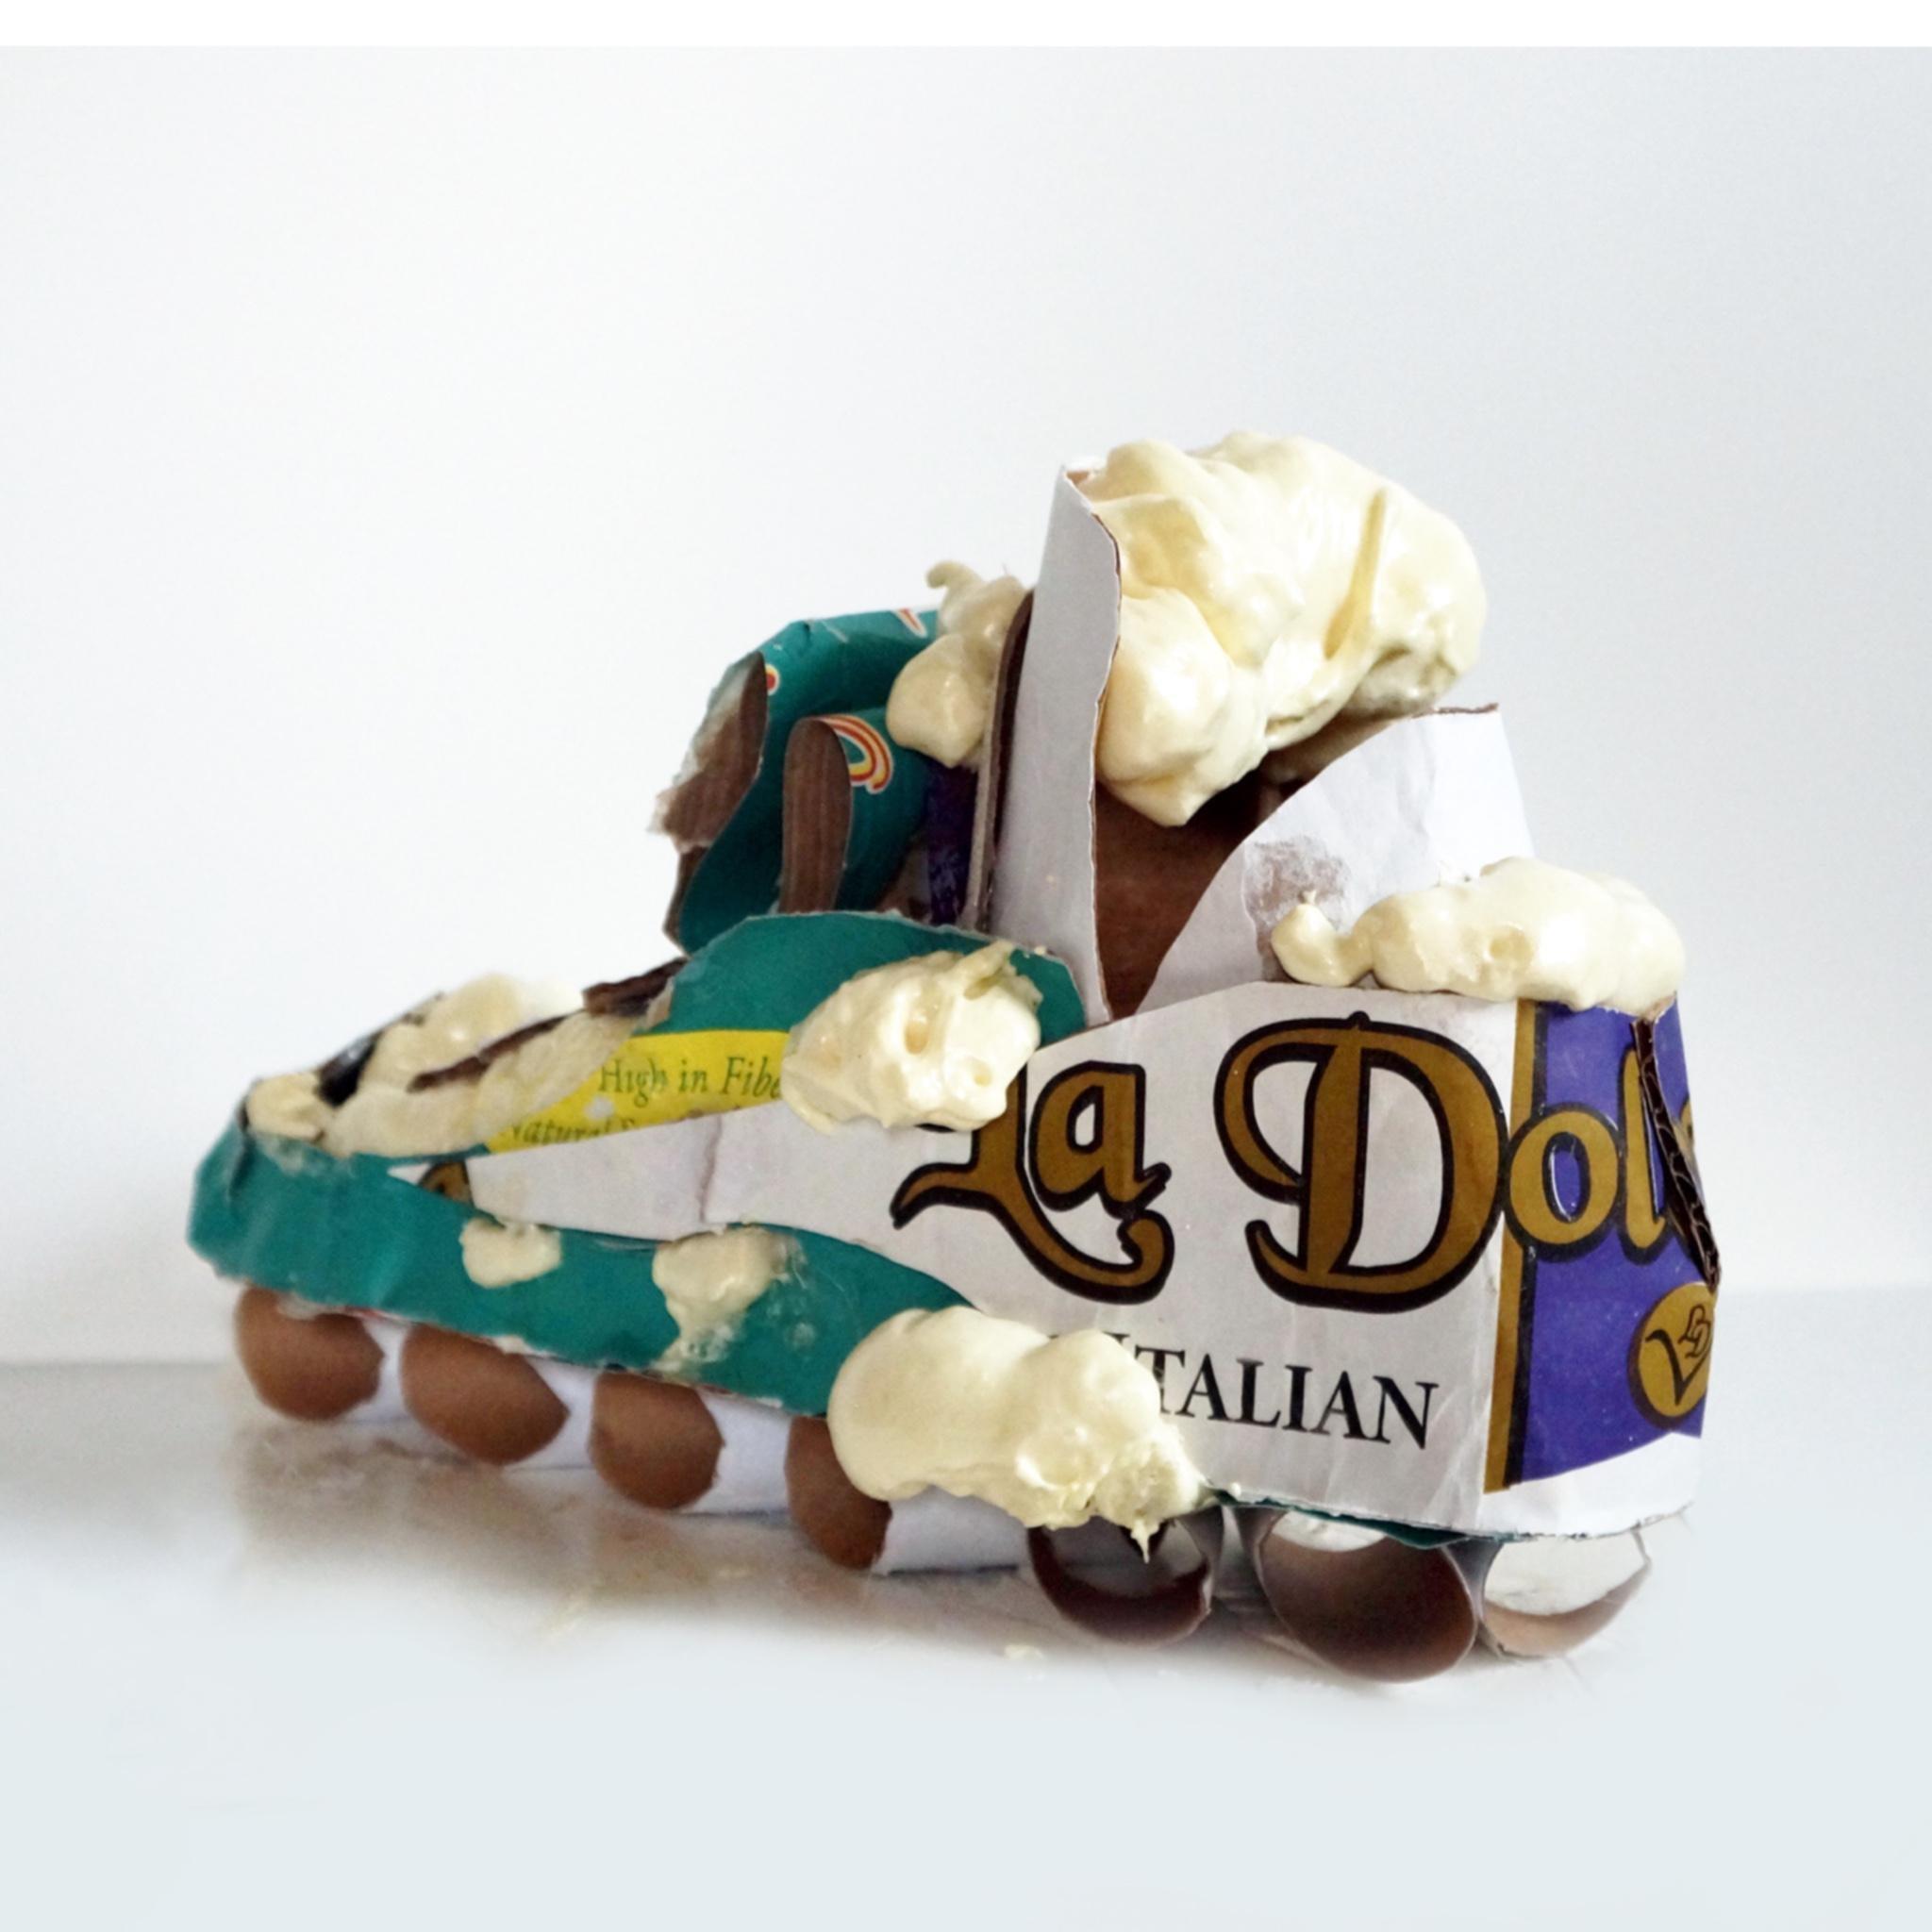 La Vita - sneaker sculpture with found paper and foam spray, textural shoe